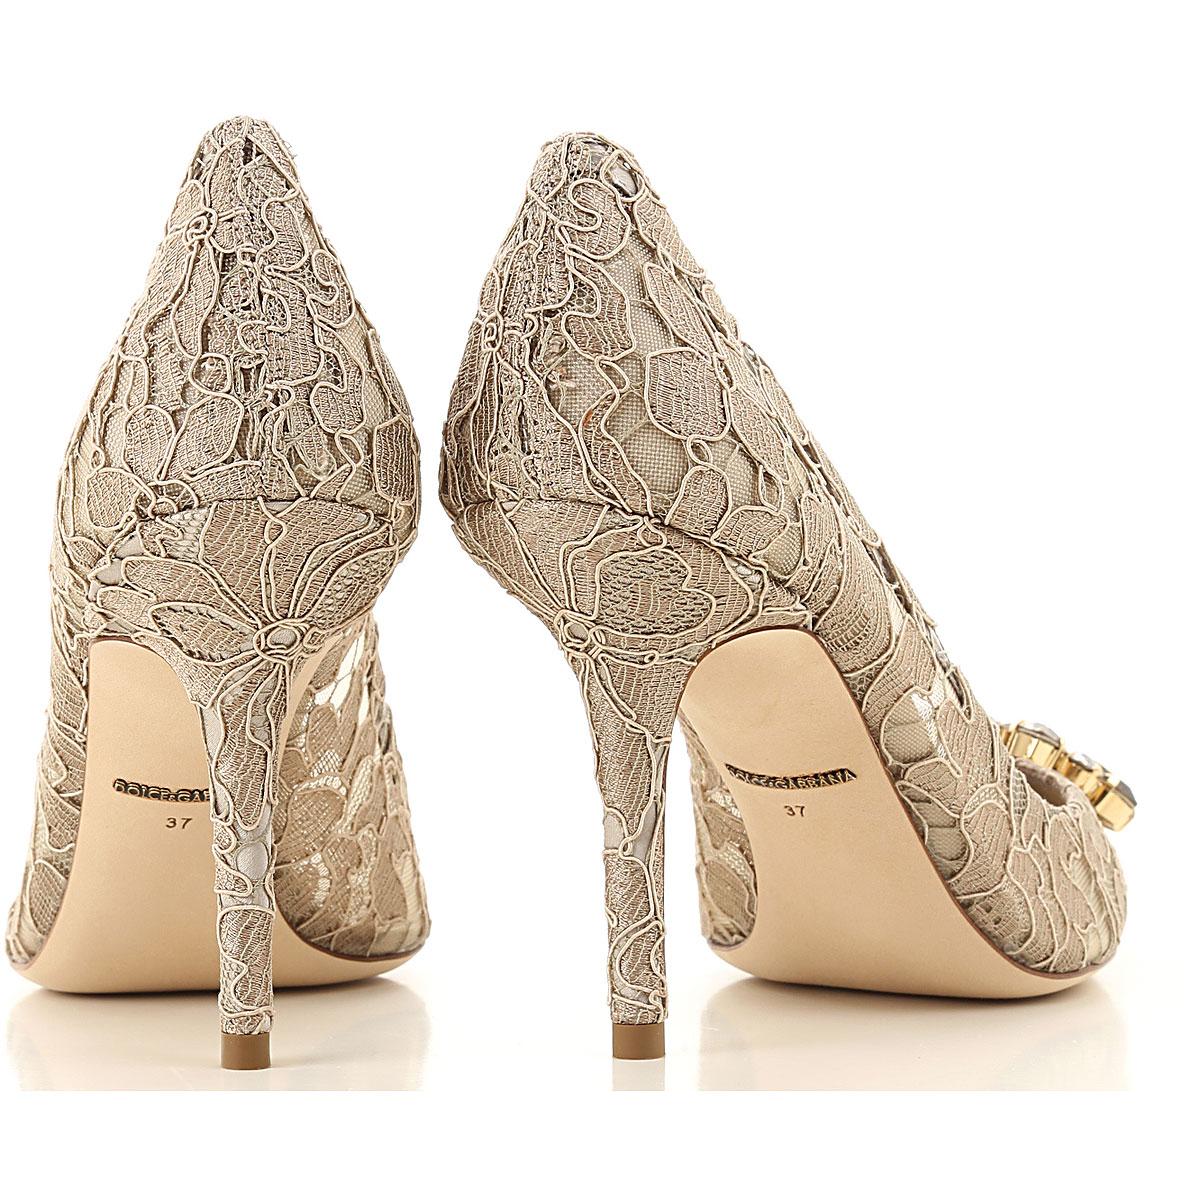 verano Gabbana amp; Mujer Para Primavera 2019 Zapatos Dolce nbsp; Arena Ywqpvq